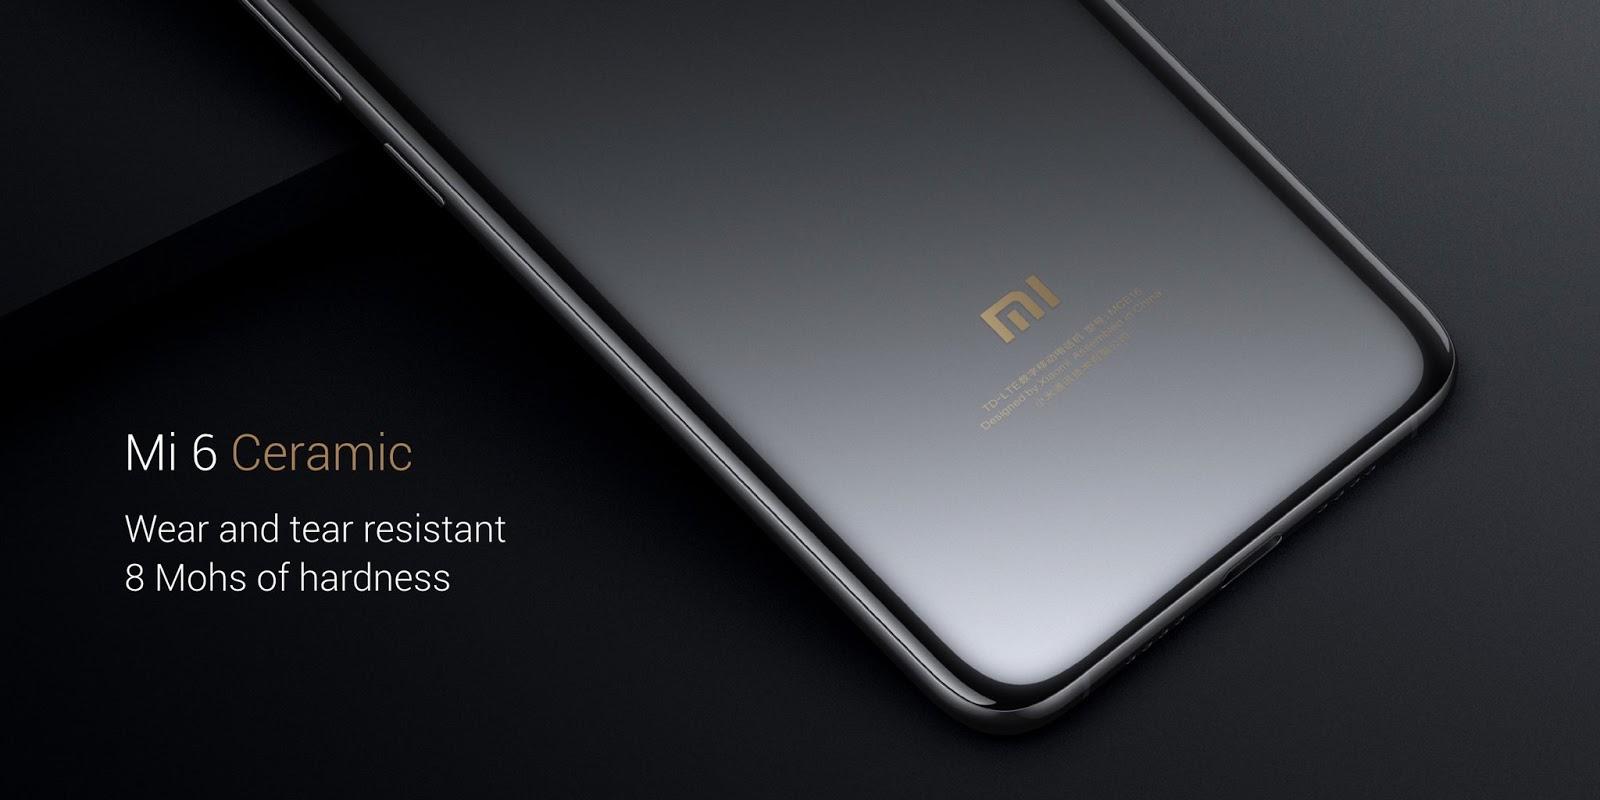 Дождались: Xiaomi Mi 6 представлен официально - 13